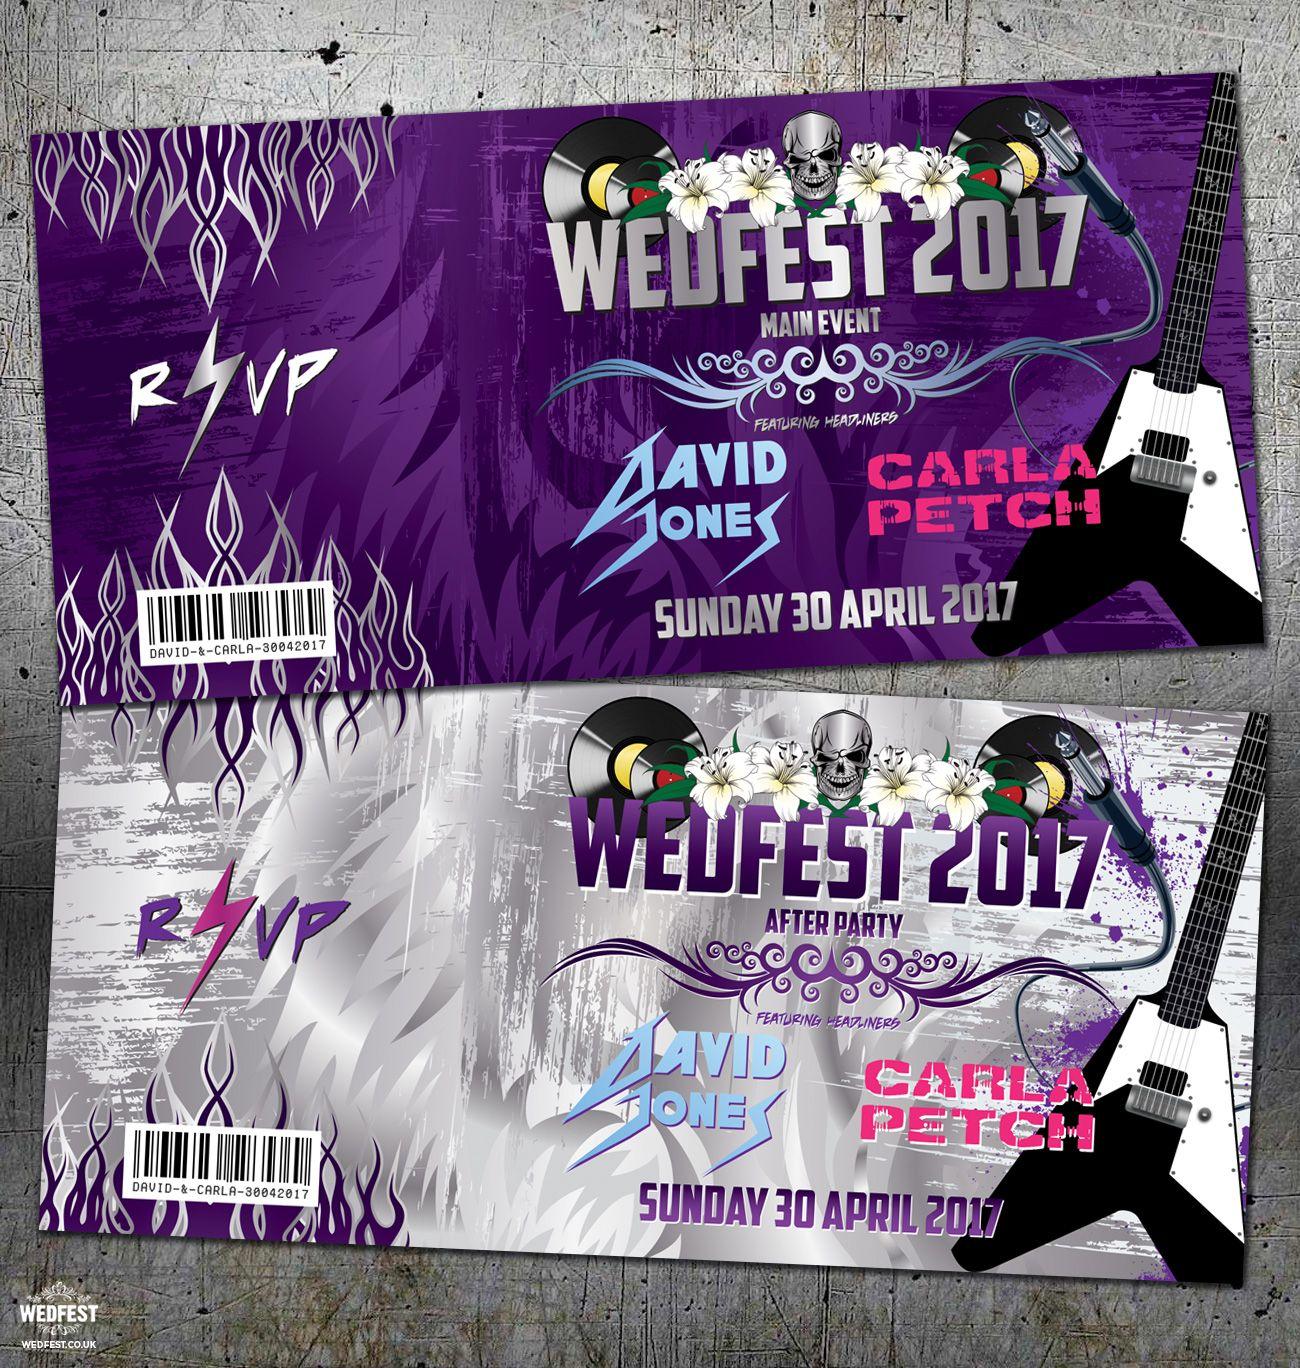 Rock Music Guitar Heavy Metal Wedding Invites Wedfestco: Heavy Metal Wedding Invitations At Websimilar.org